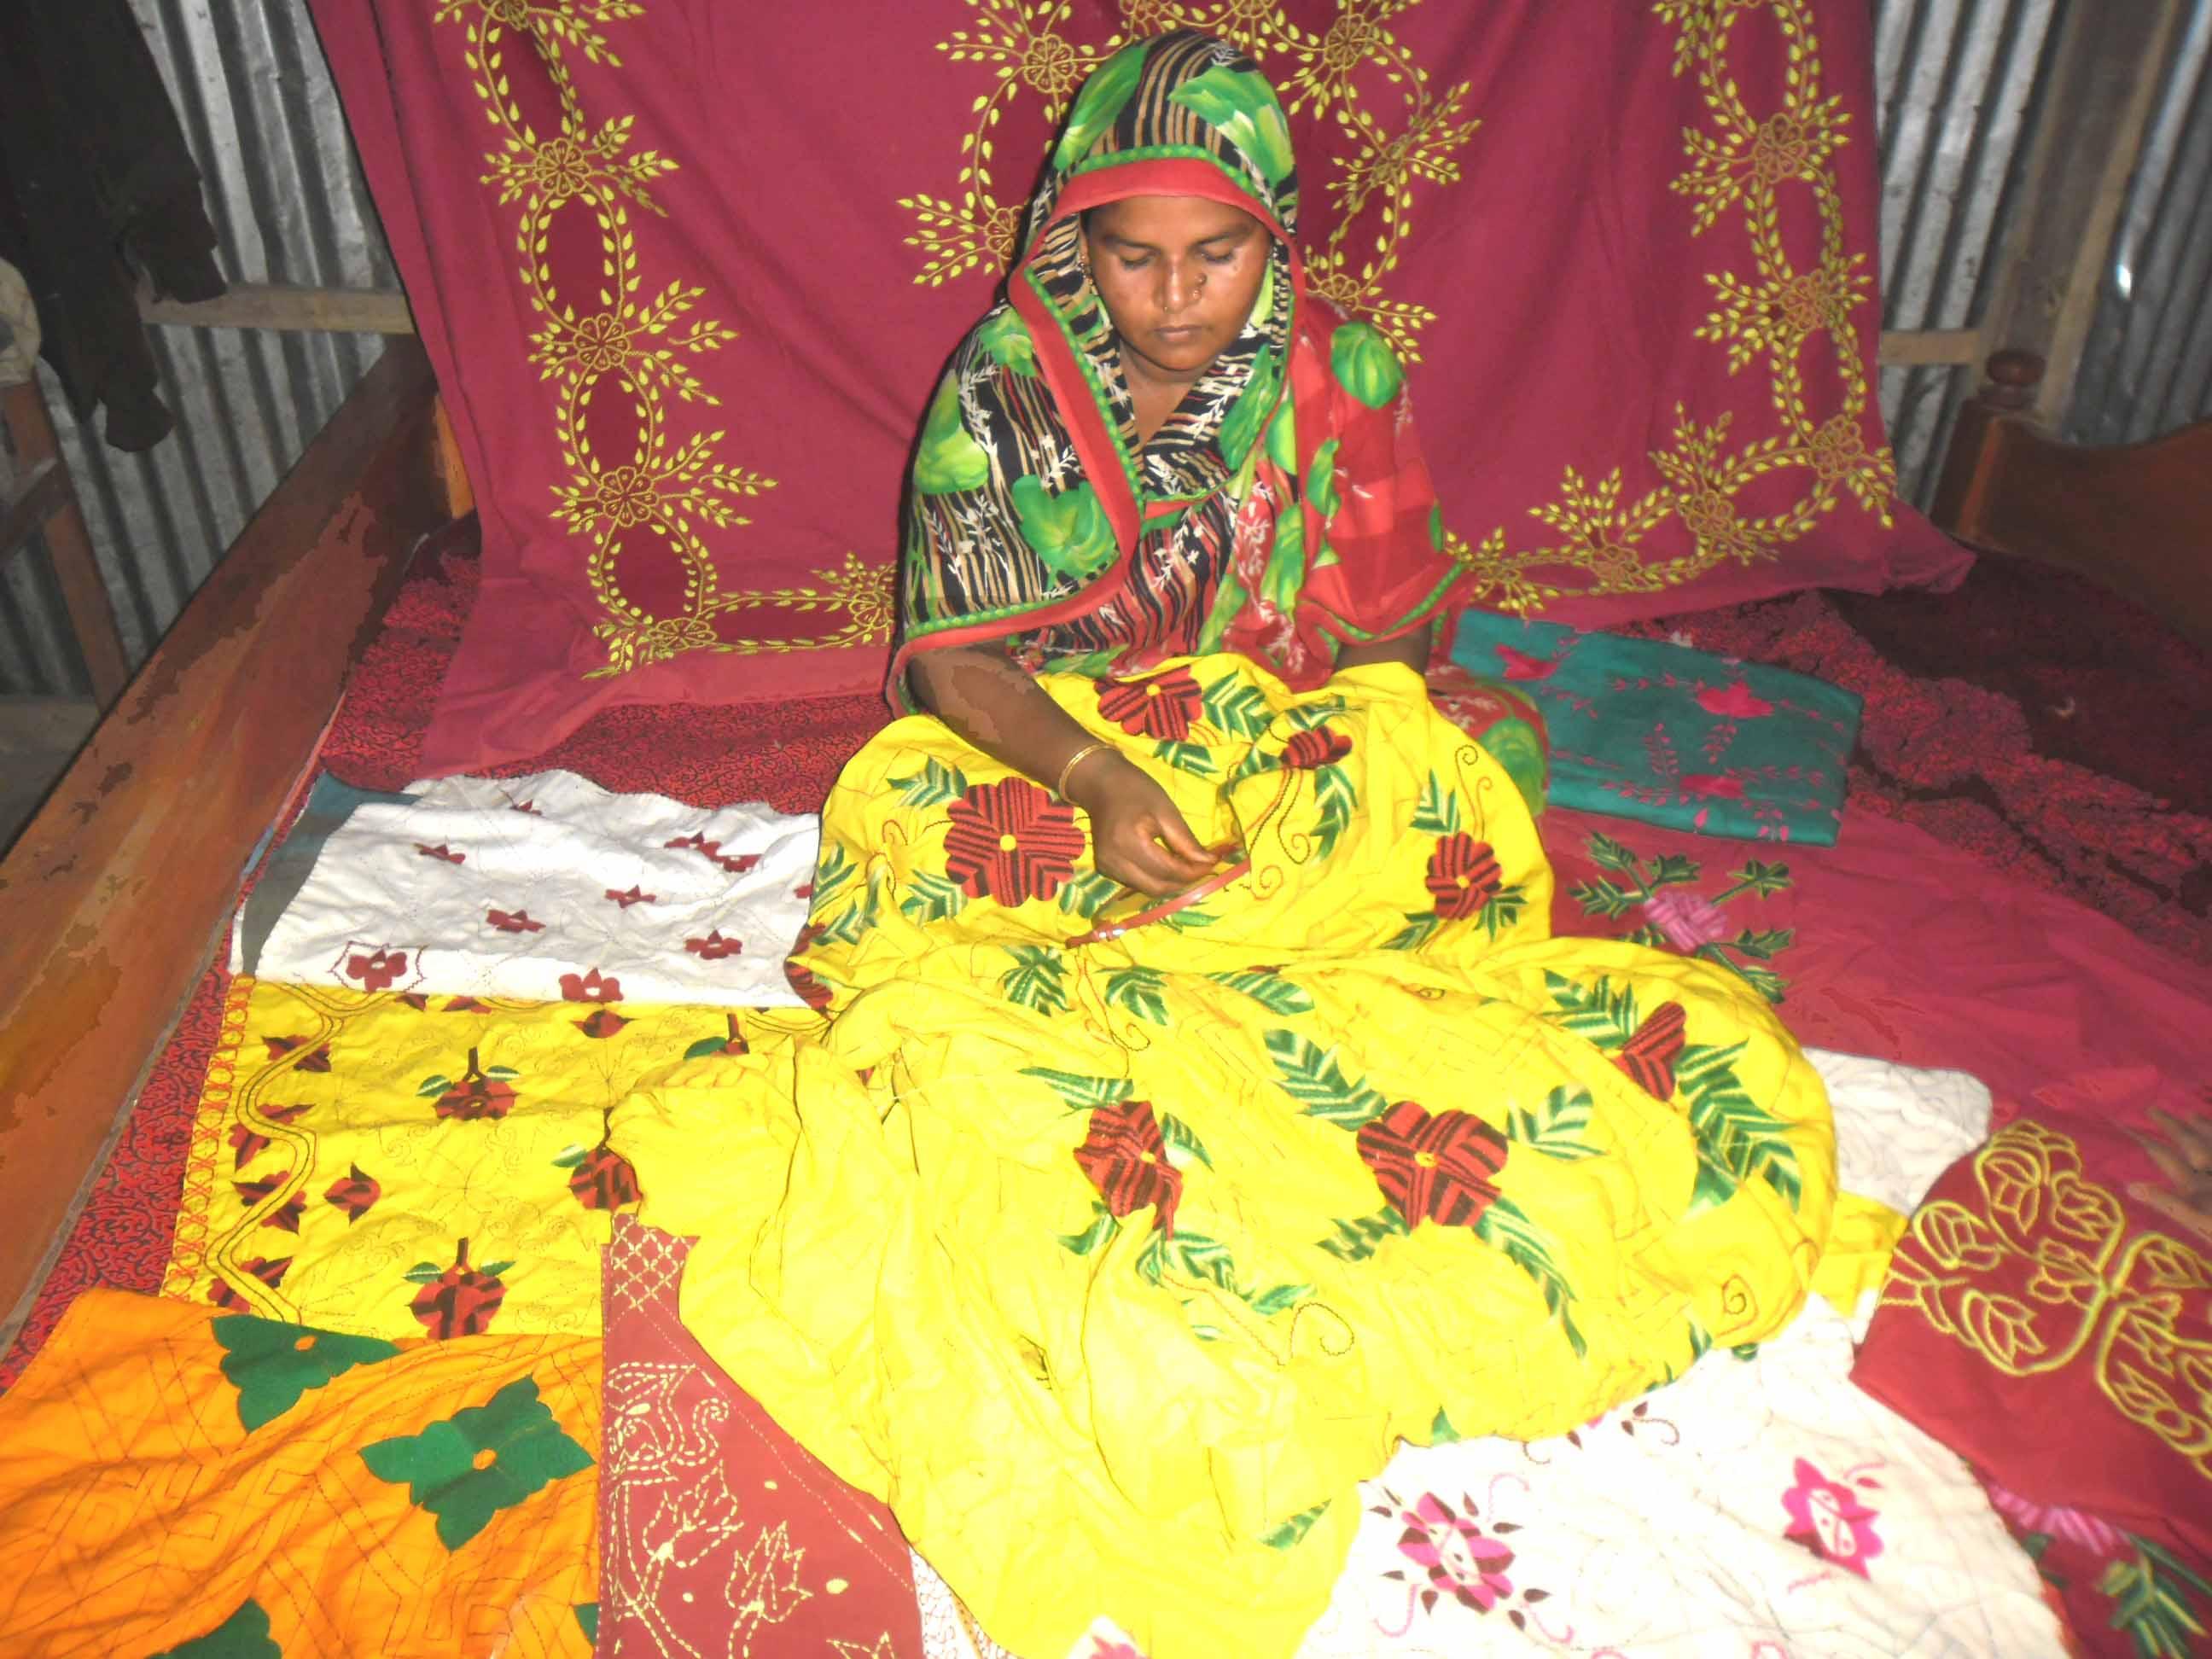 Handicraft (Nakshi Katha), Hasina Khatun, Paksiya W.S. Burhanuddin, Bhola